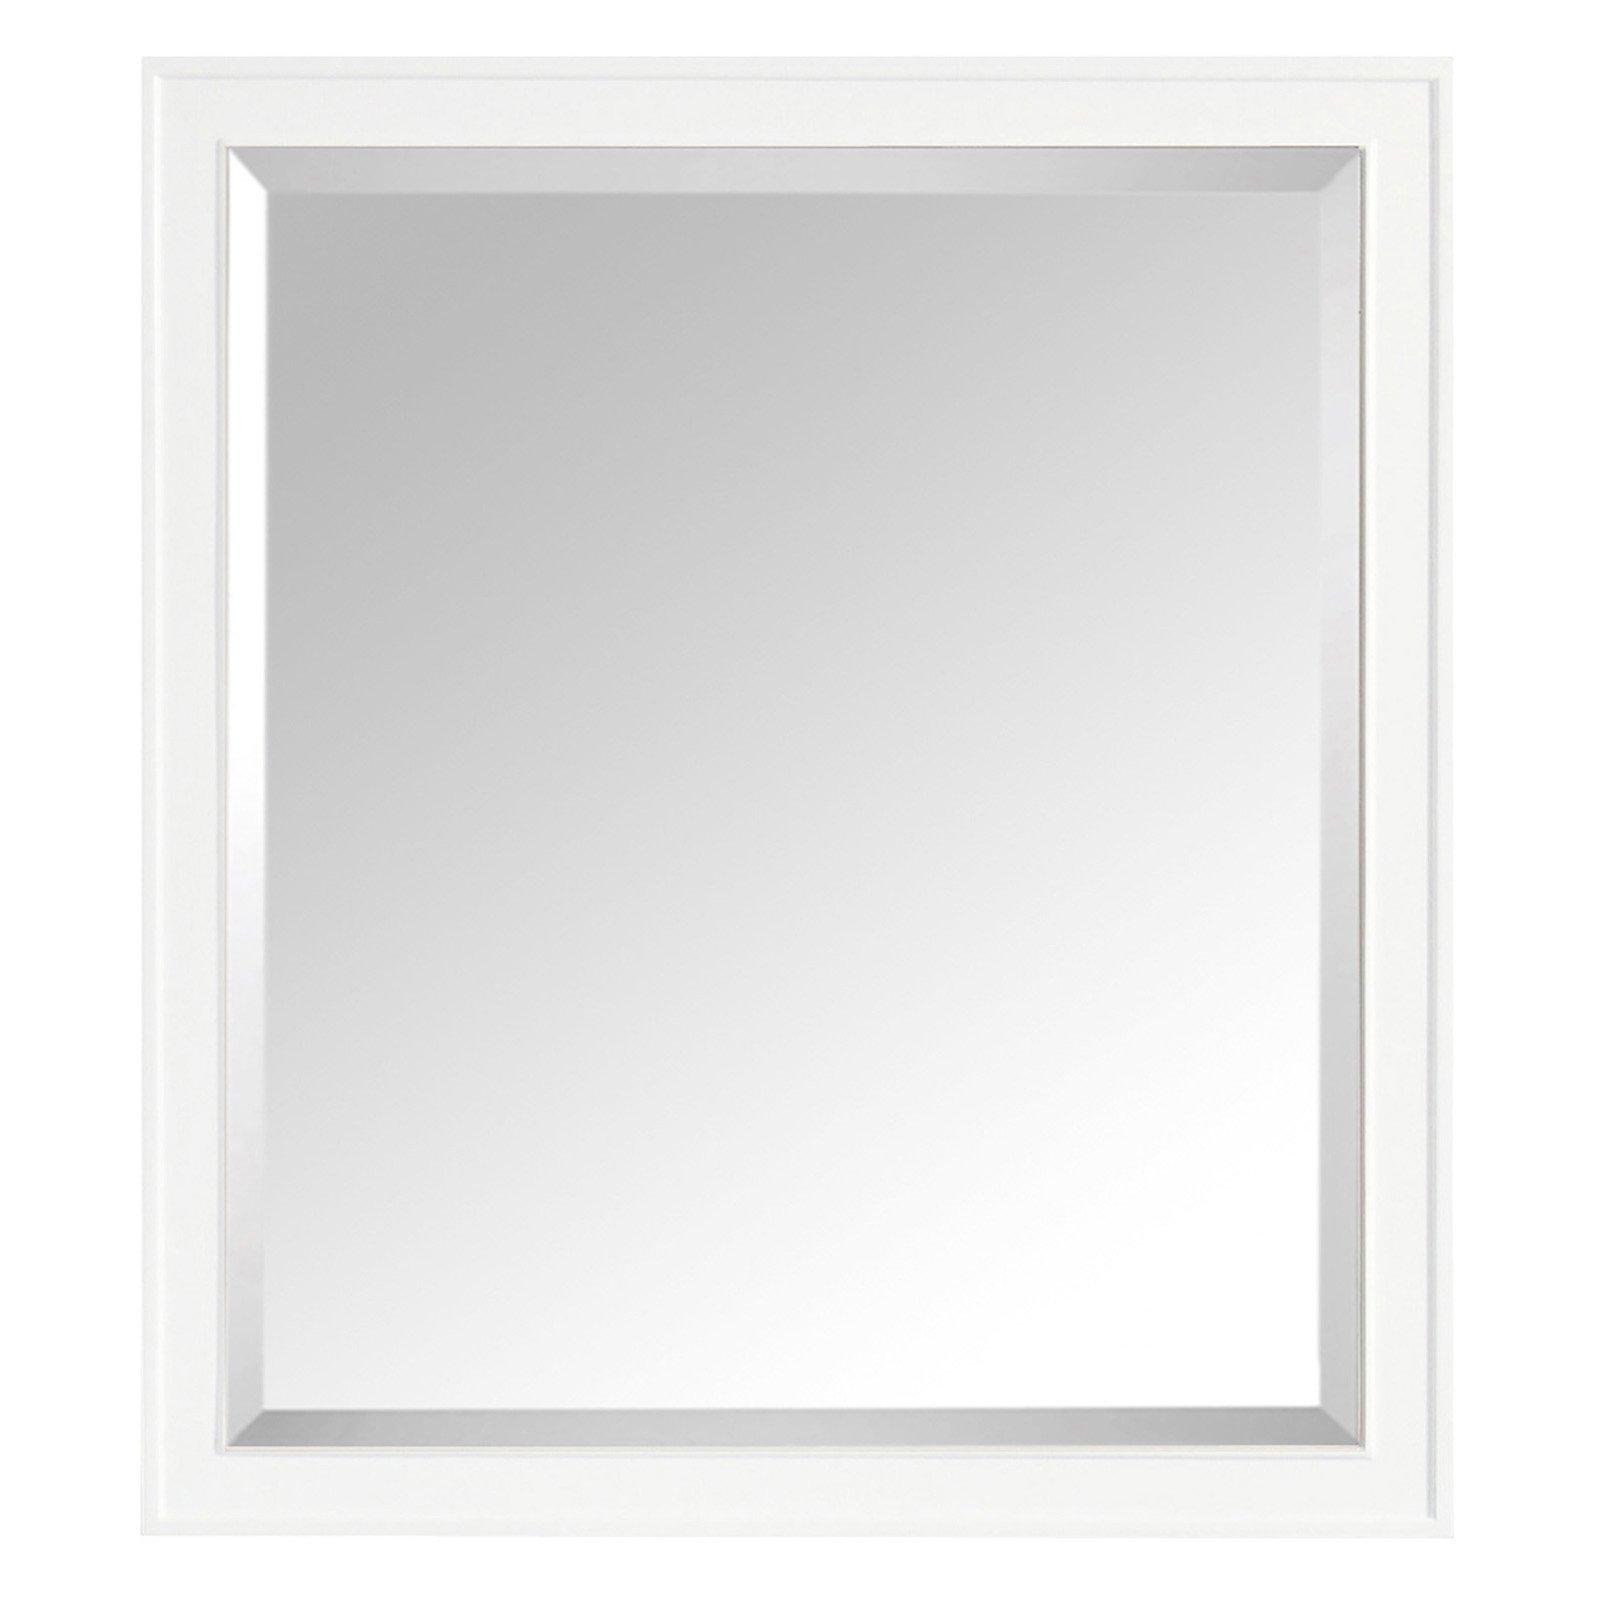 Avanity Madison Bathroom Wall Mirror - Walmart.com